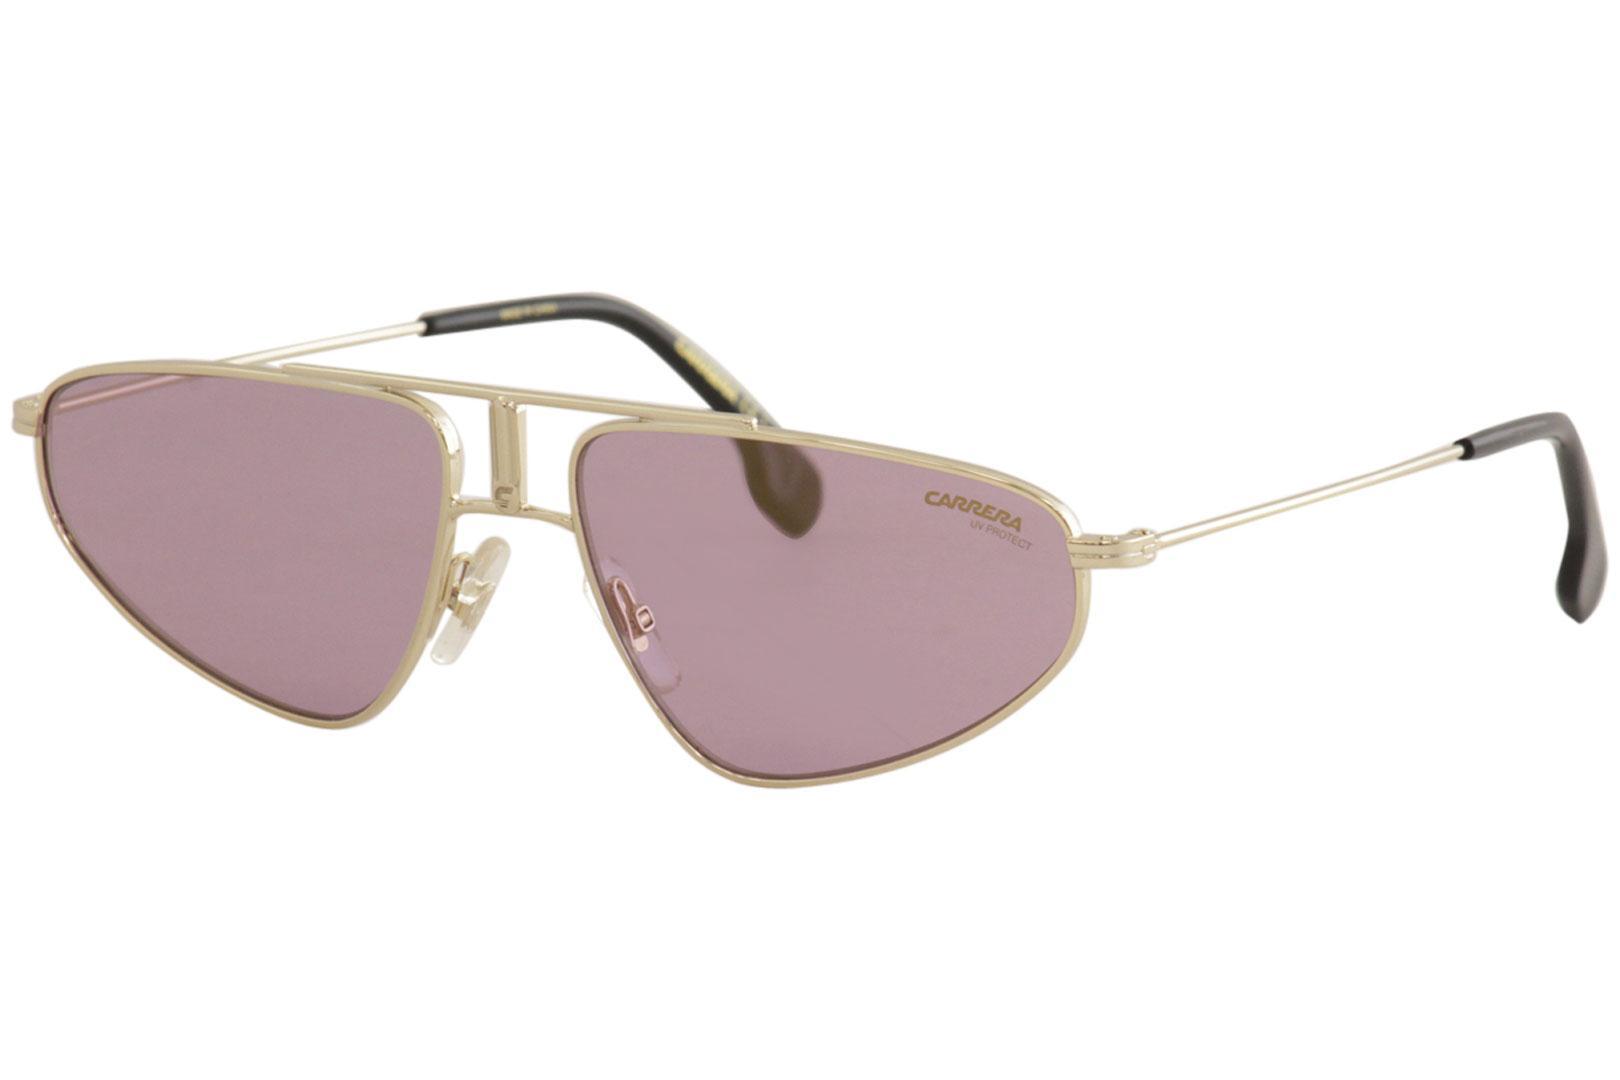 5e1d1e703743 Carrera Gipsy/S GipsyS HMF/V4 Black/White Aviator Sunglasses 64mm